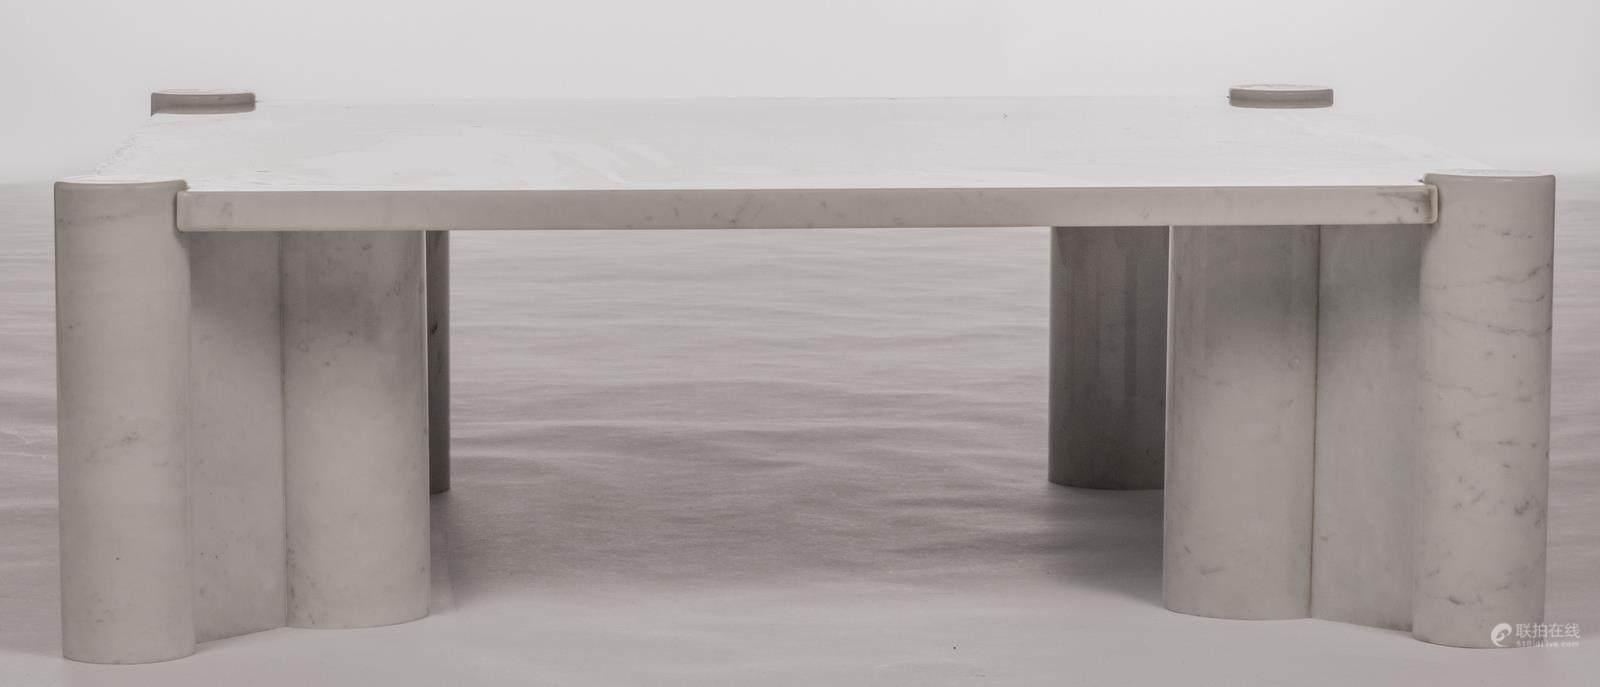 51bidlive a marble design coffee table so called u0027jumbo coffee